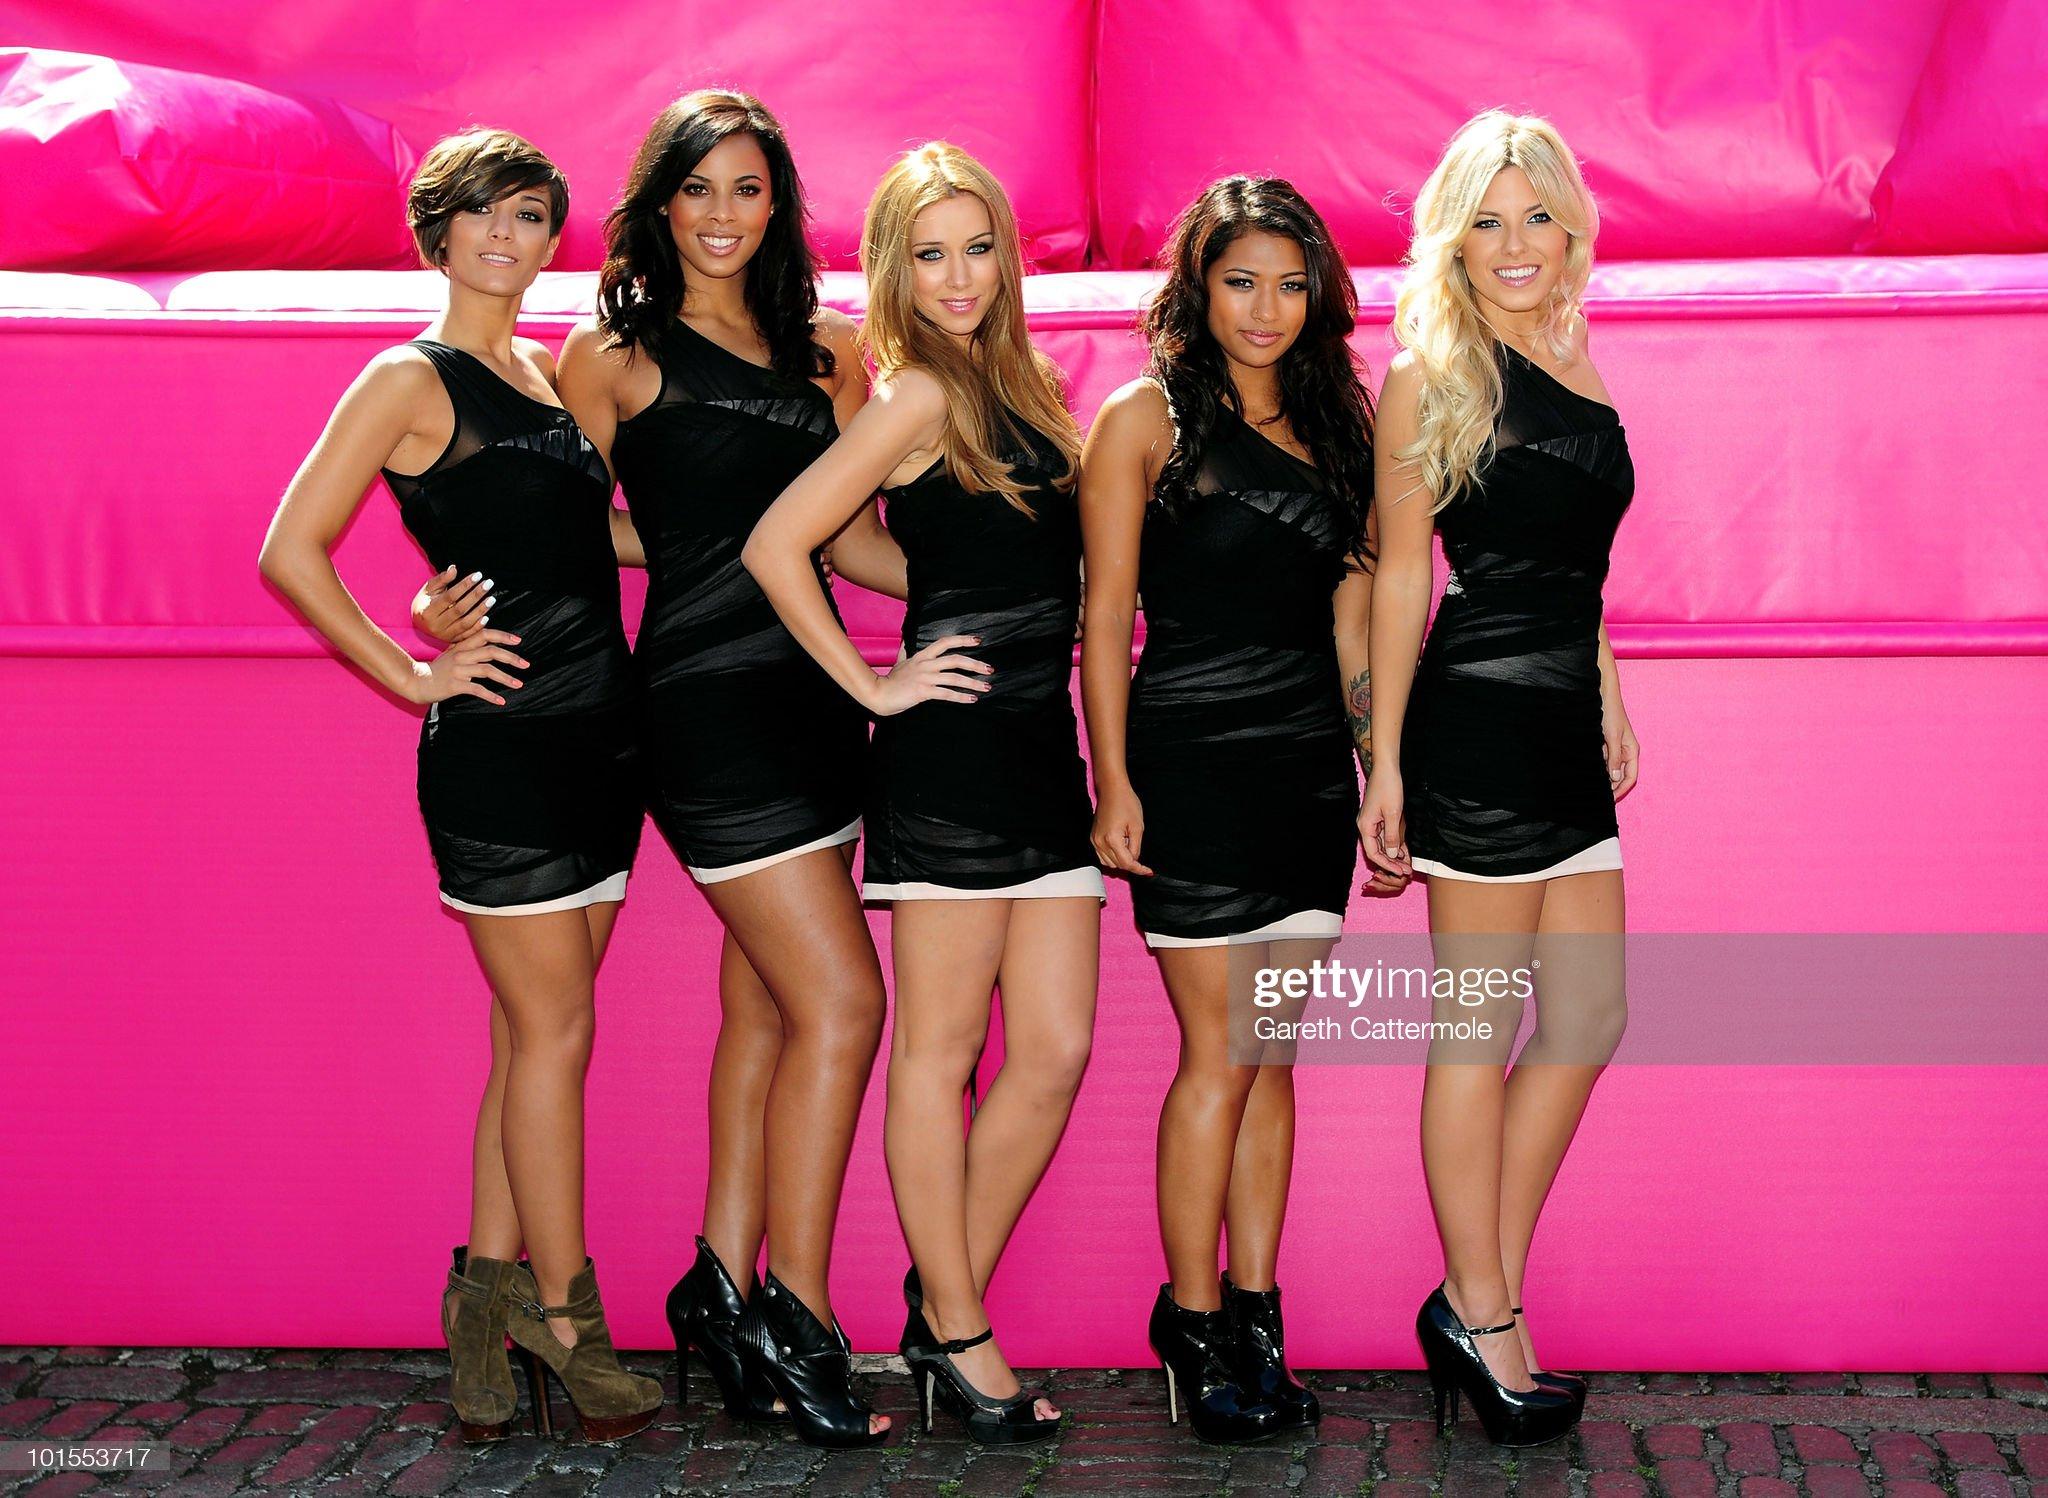 ¿Cuánto mide Vanessa White? - Altura - Real height Frankie-sandford-rochelle-wiseman-una-healyvanessa-white-and-mollie-picture-id101553717?s=2048x2048